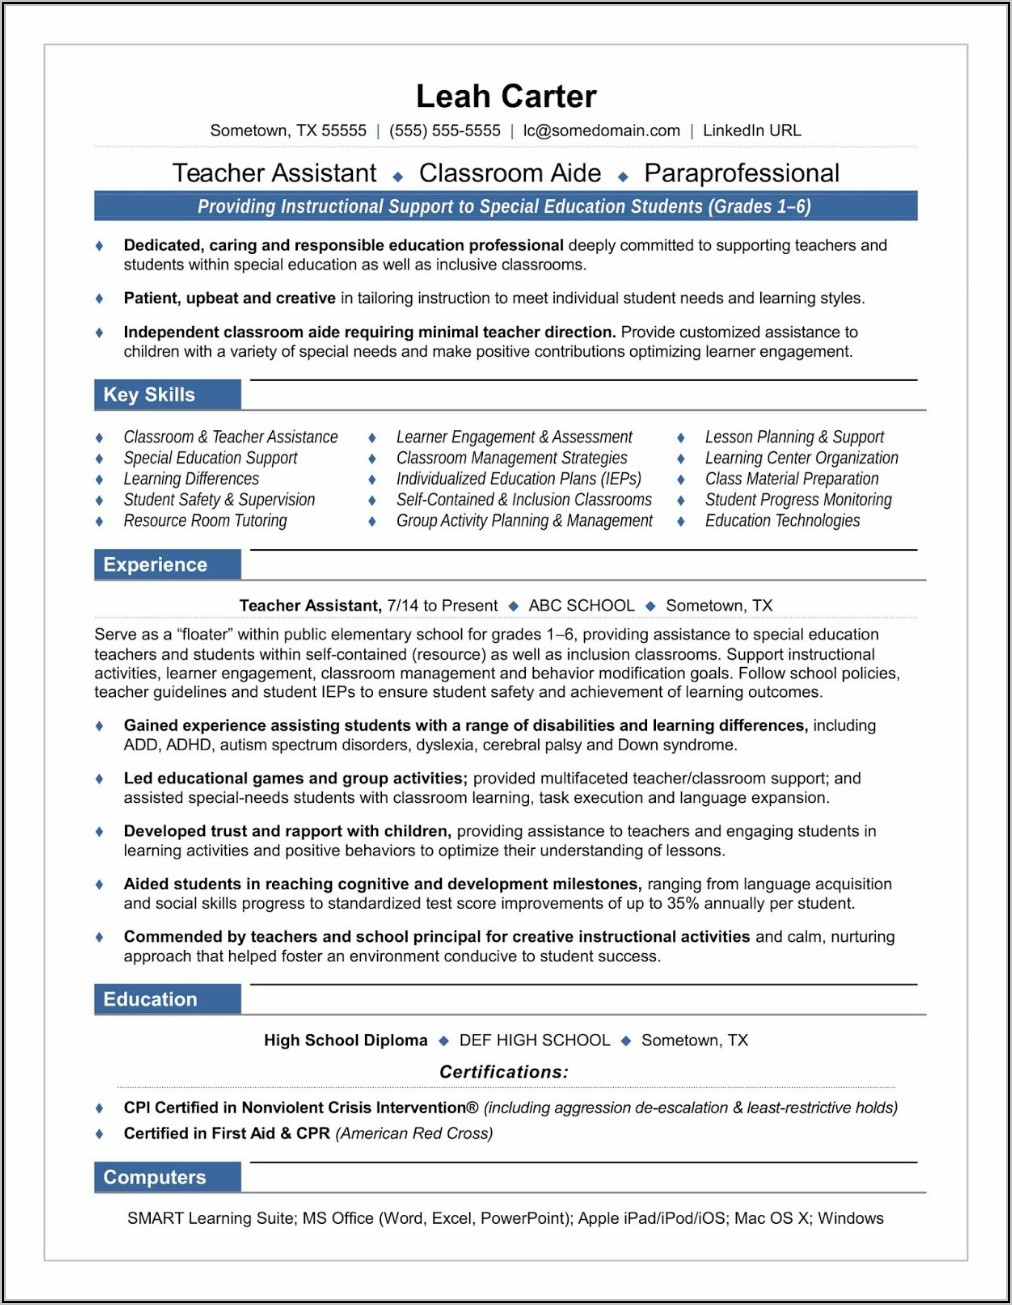 Free Teacher Resume Templates 2019